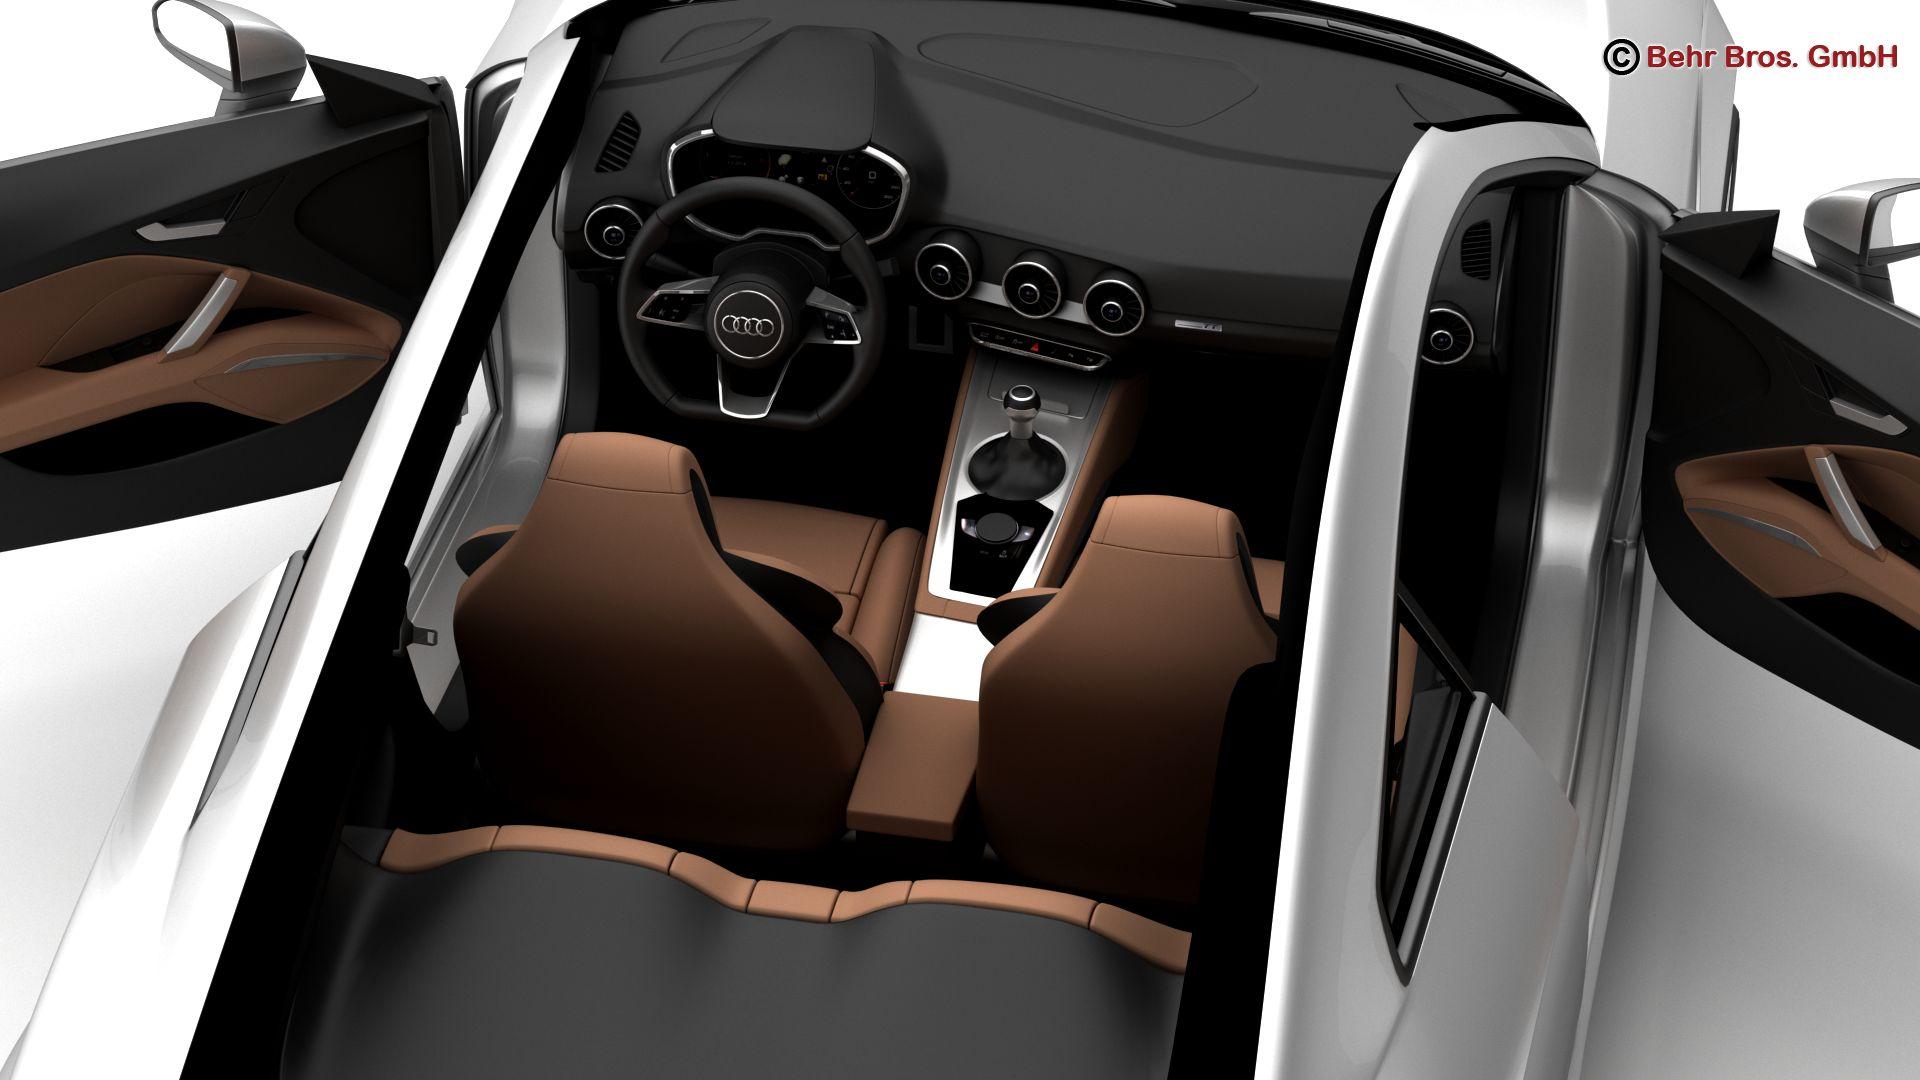 audi tt coupe 2015 3d model 3ds max fbx c4d lwo ma mb obj 203333